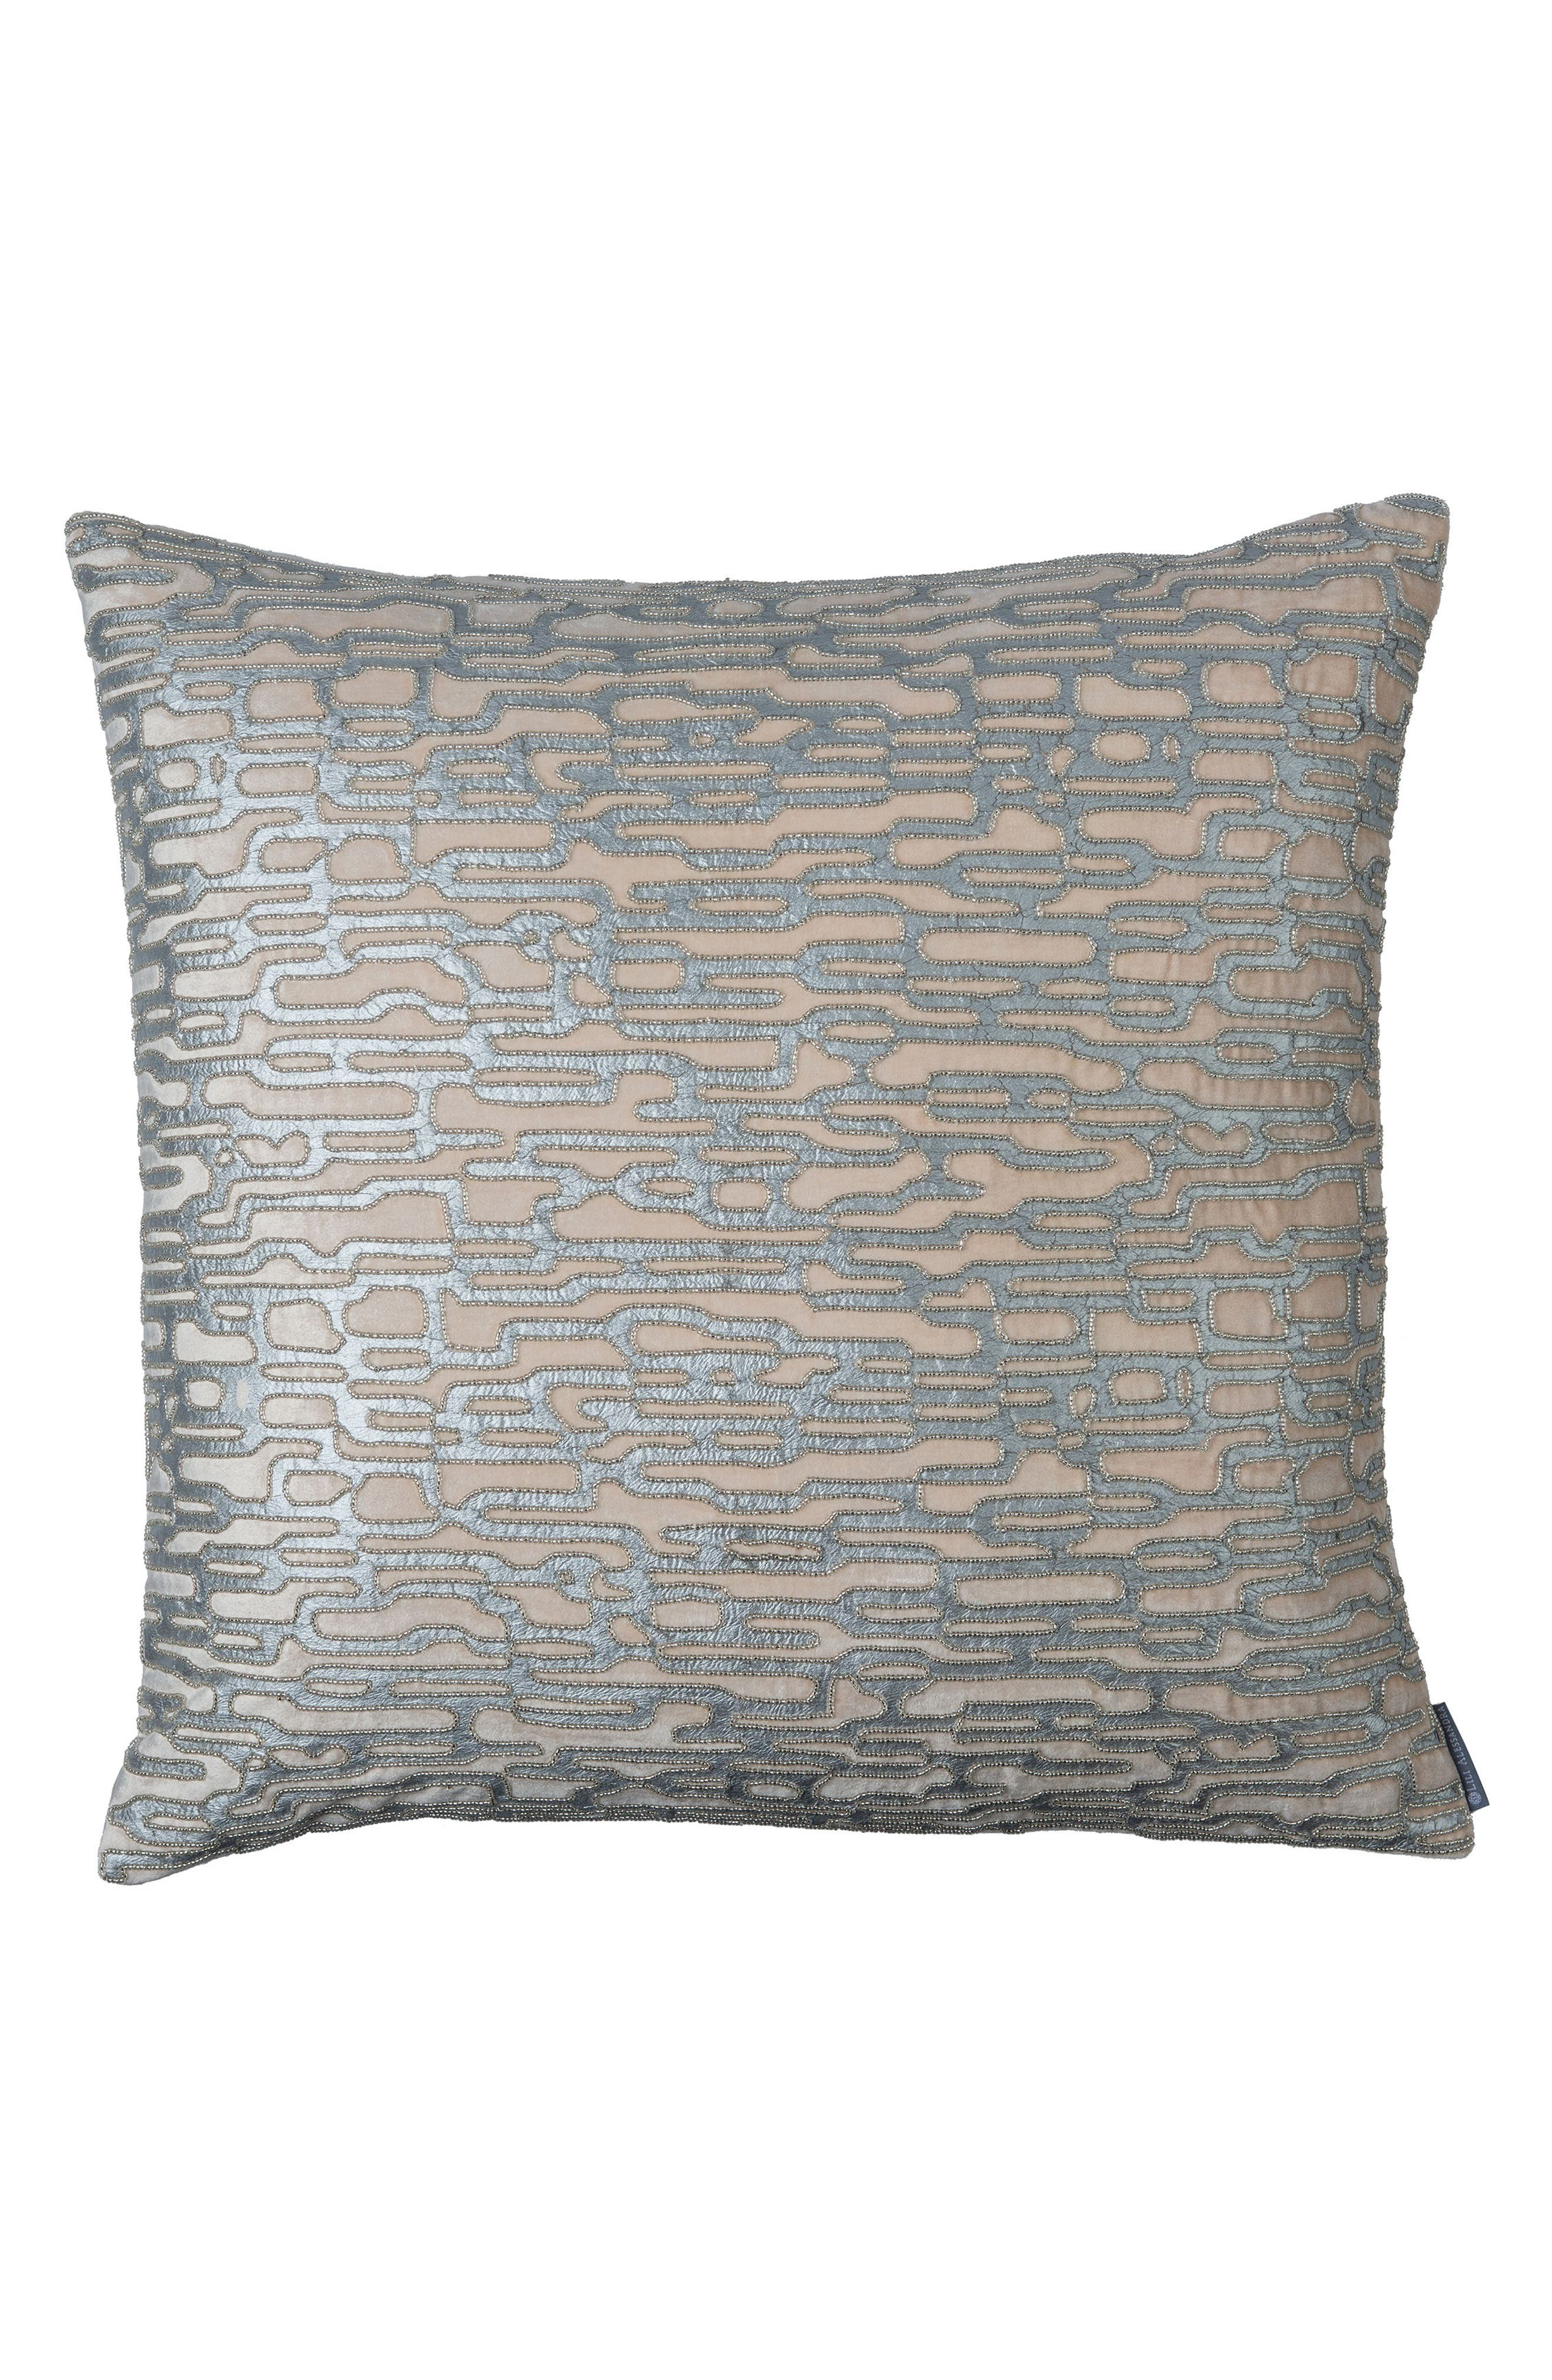 Lili Alessandra Christian Beaded Accent Pillow